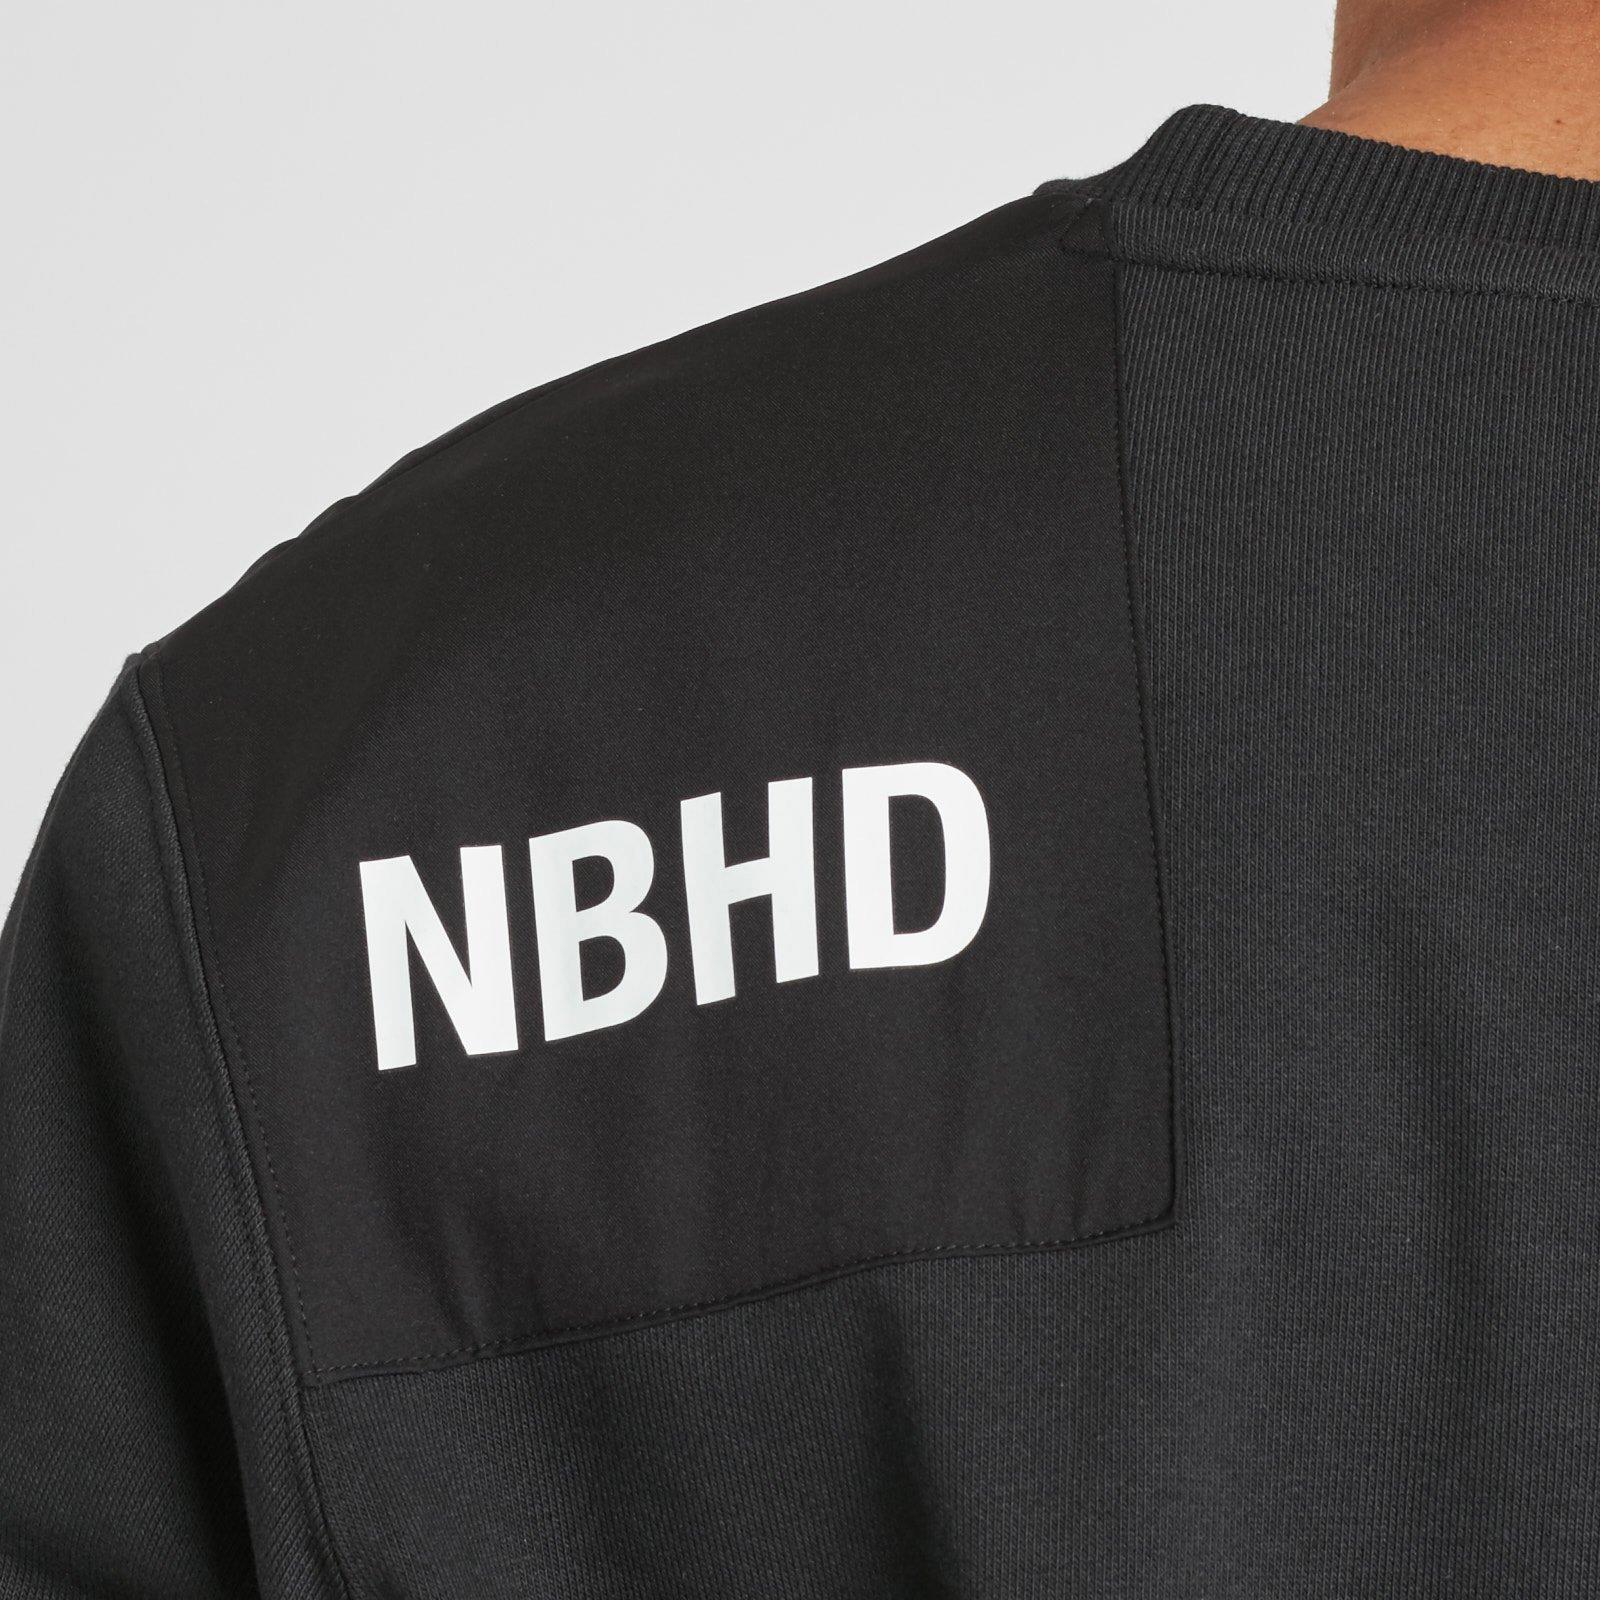 c1b258df adidas Commander Sweater x Neighborhood - Cd7734 - Sneakersnstuff I ...